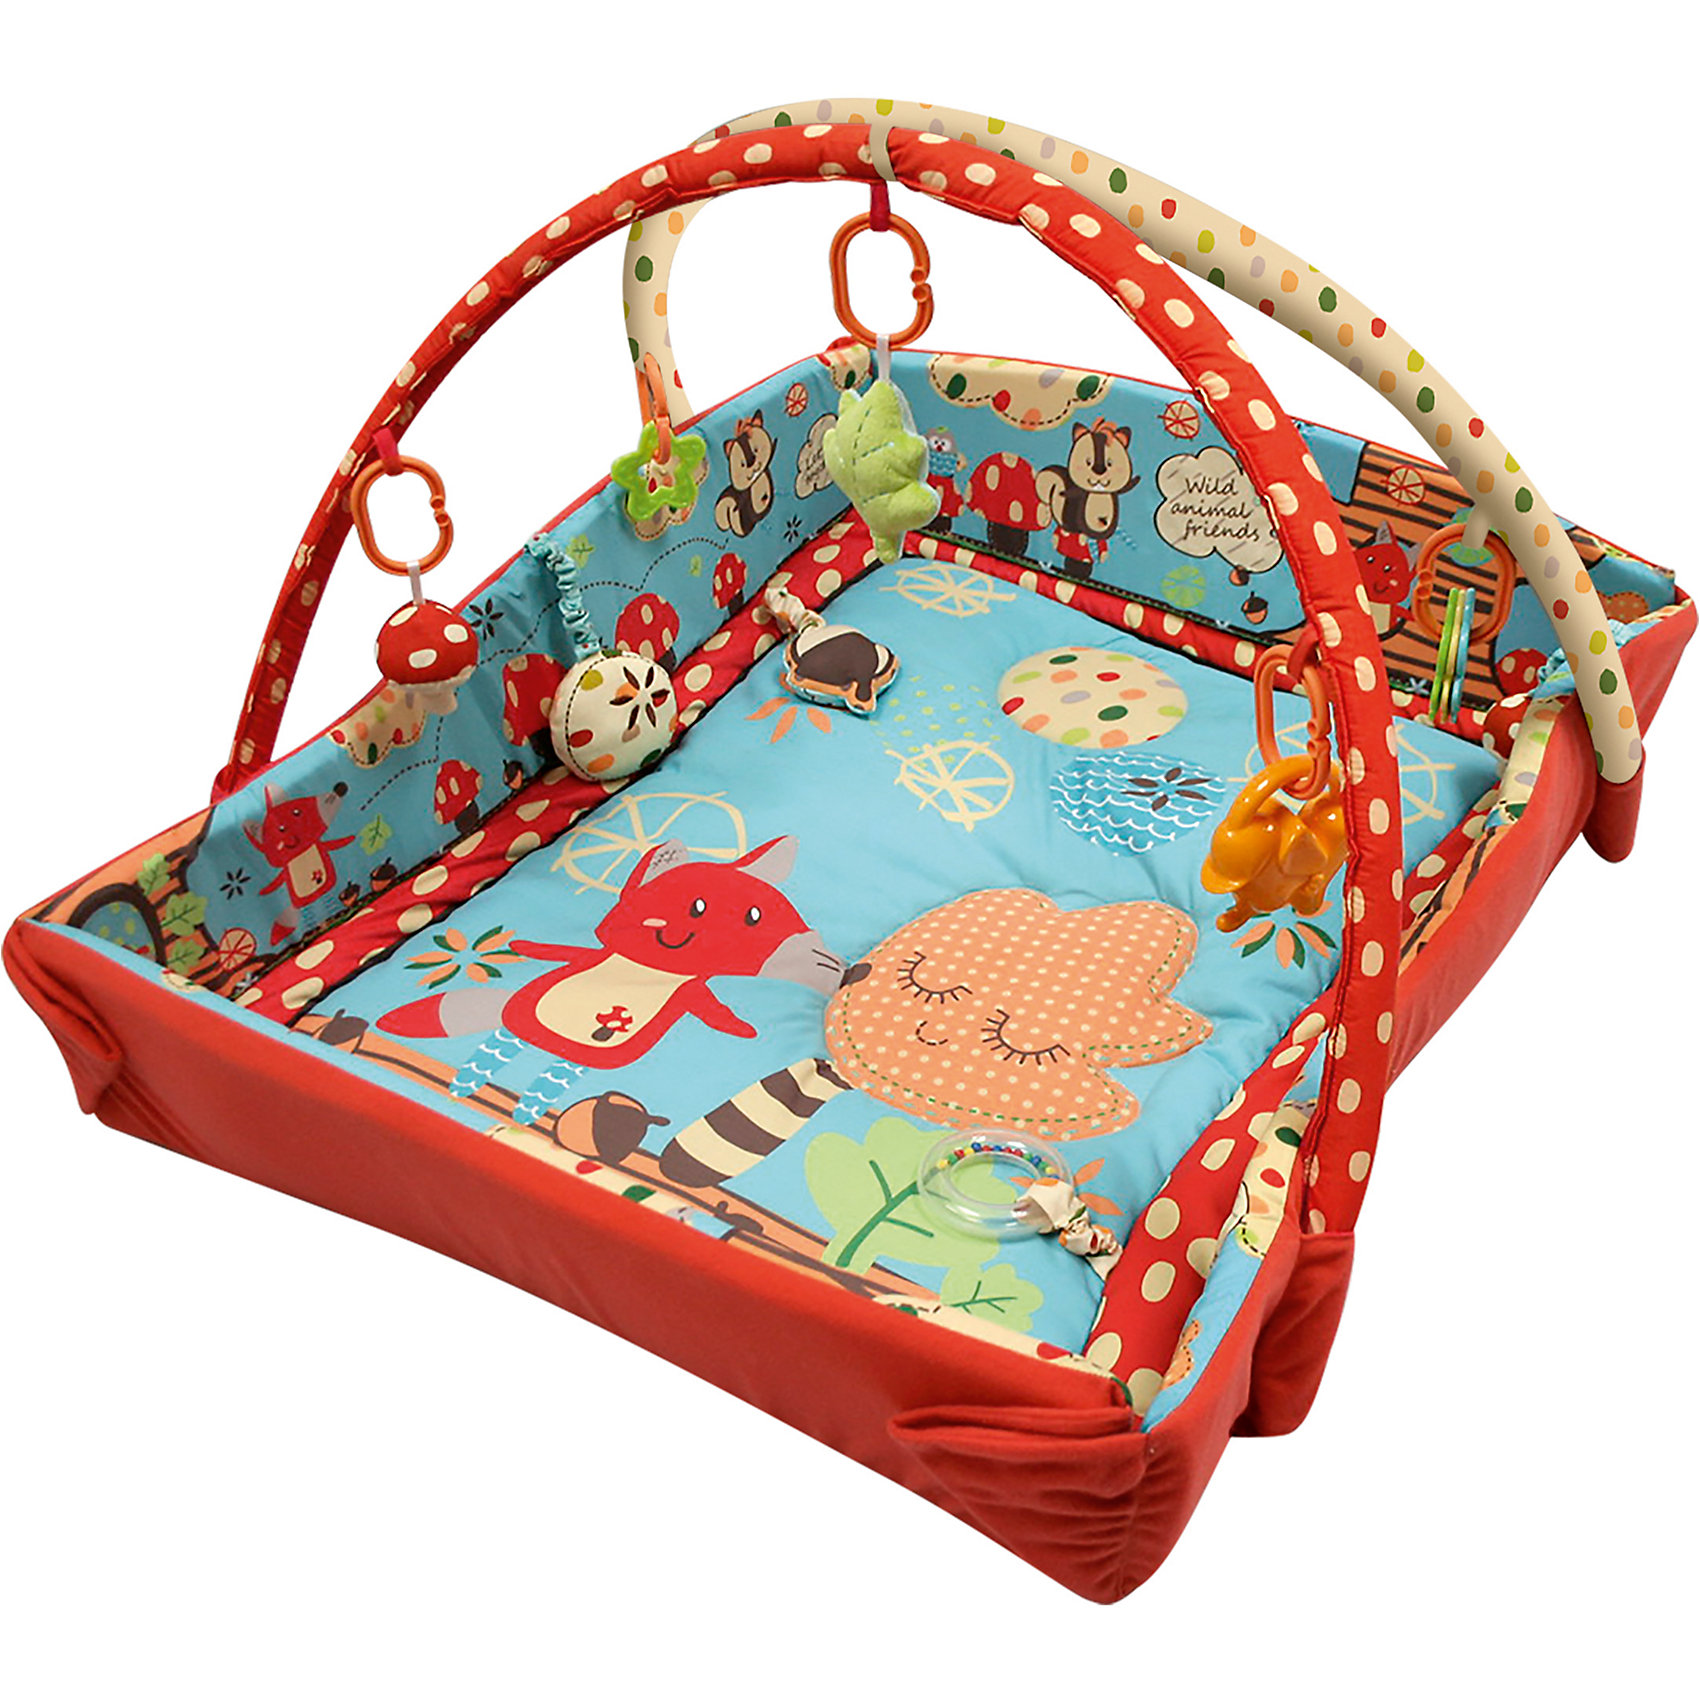 Roxy-Kids Развивающий коврик Лисичка и ее друзья с бортиками, Roxy-Kids roxy kids с прицелом лягушка голубой